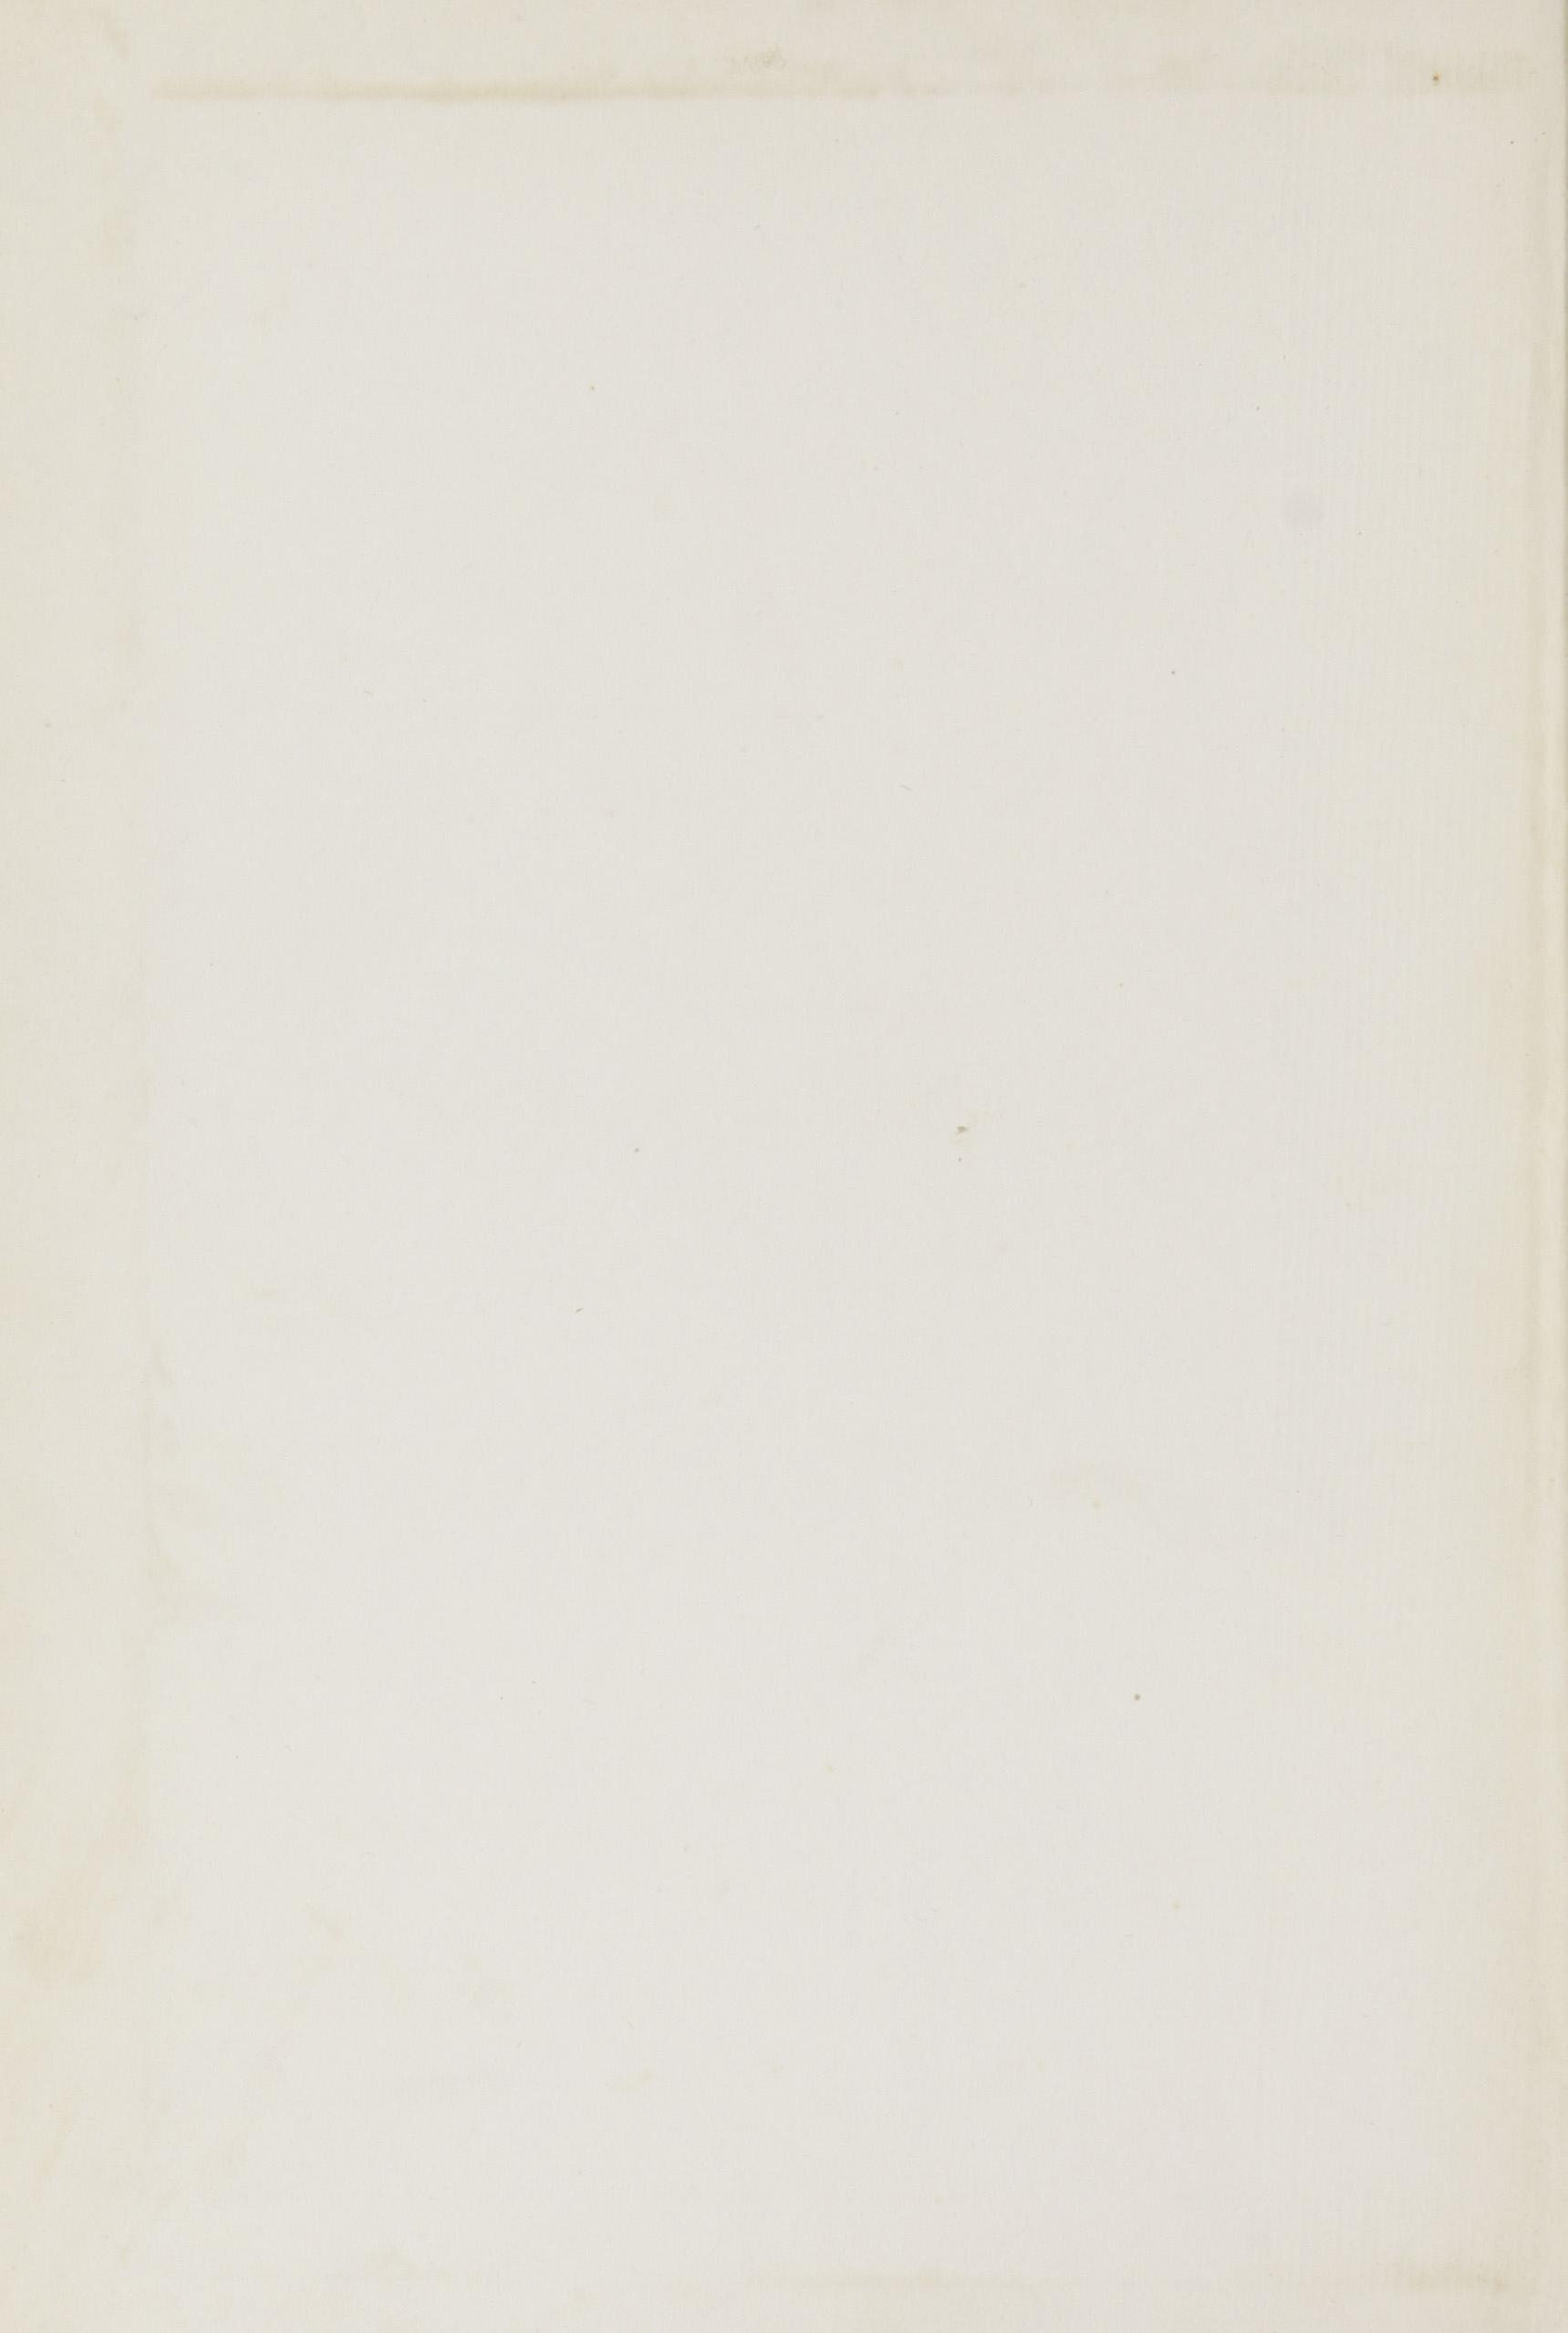 Charleston Yearbook, 1943, inside cover